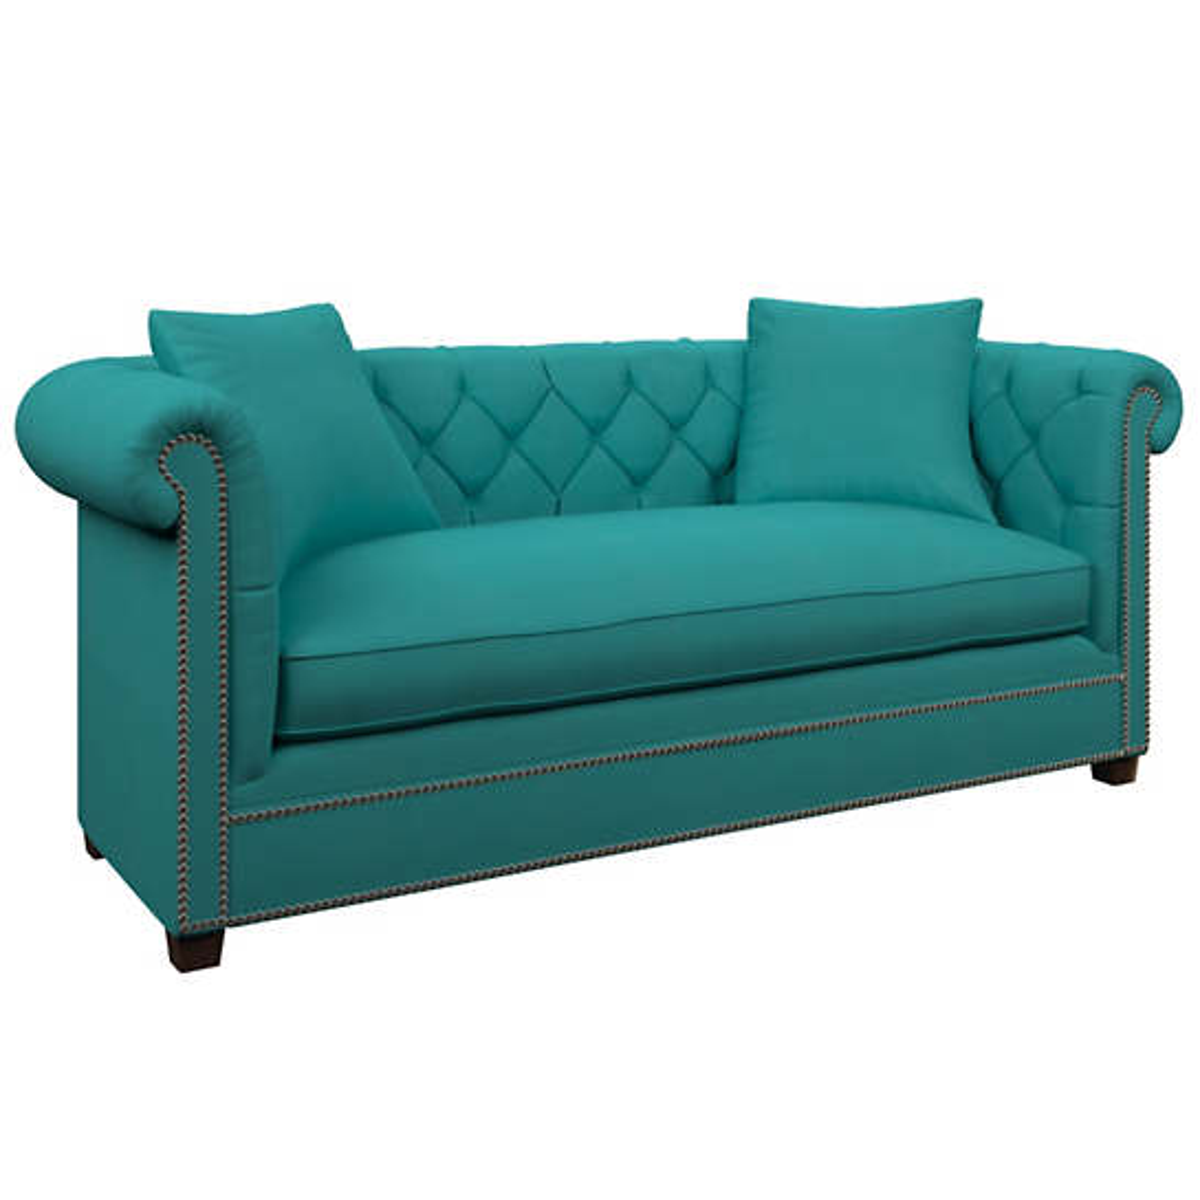 Estate Linen Turquoise Richmond Sofa